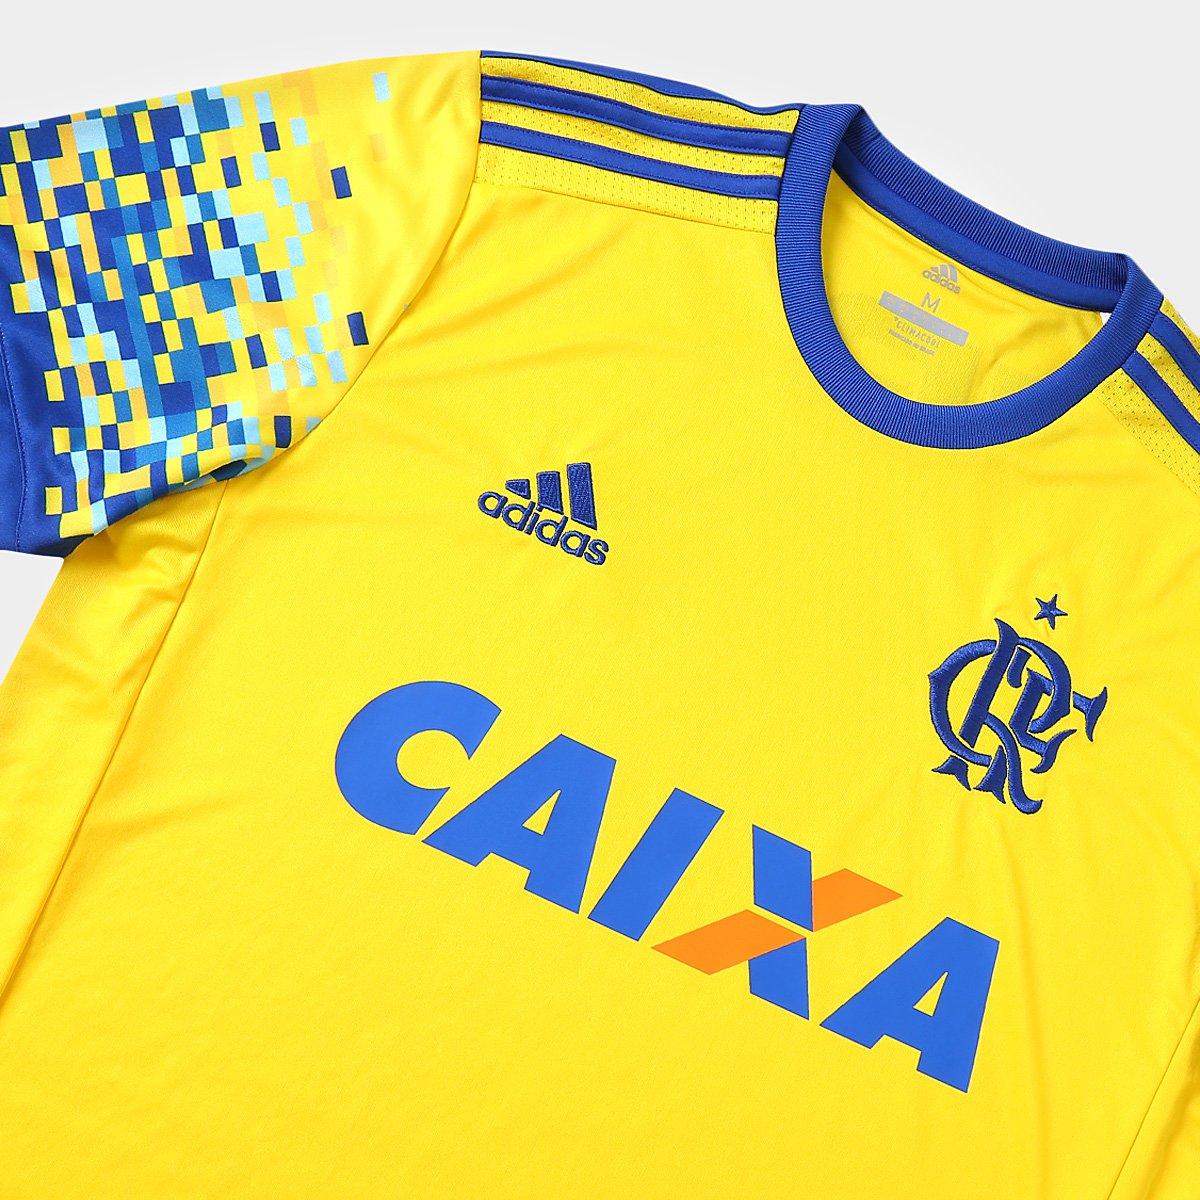 Camisa Flamengo III 17 18 s nº Torcedor Adidas Masculina - Compre ... 3f0c784bbb8aa